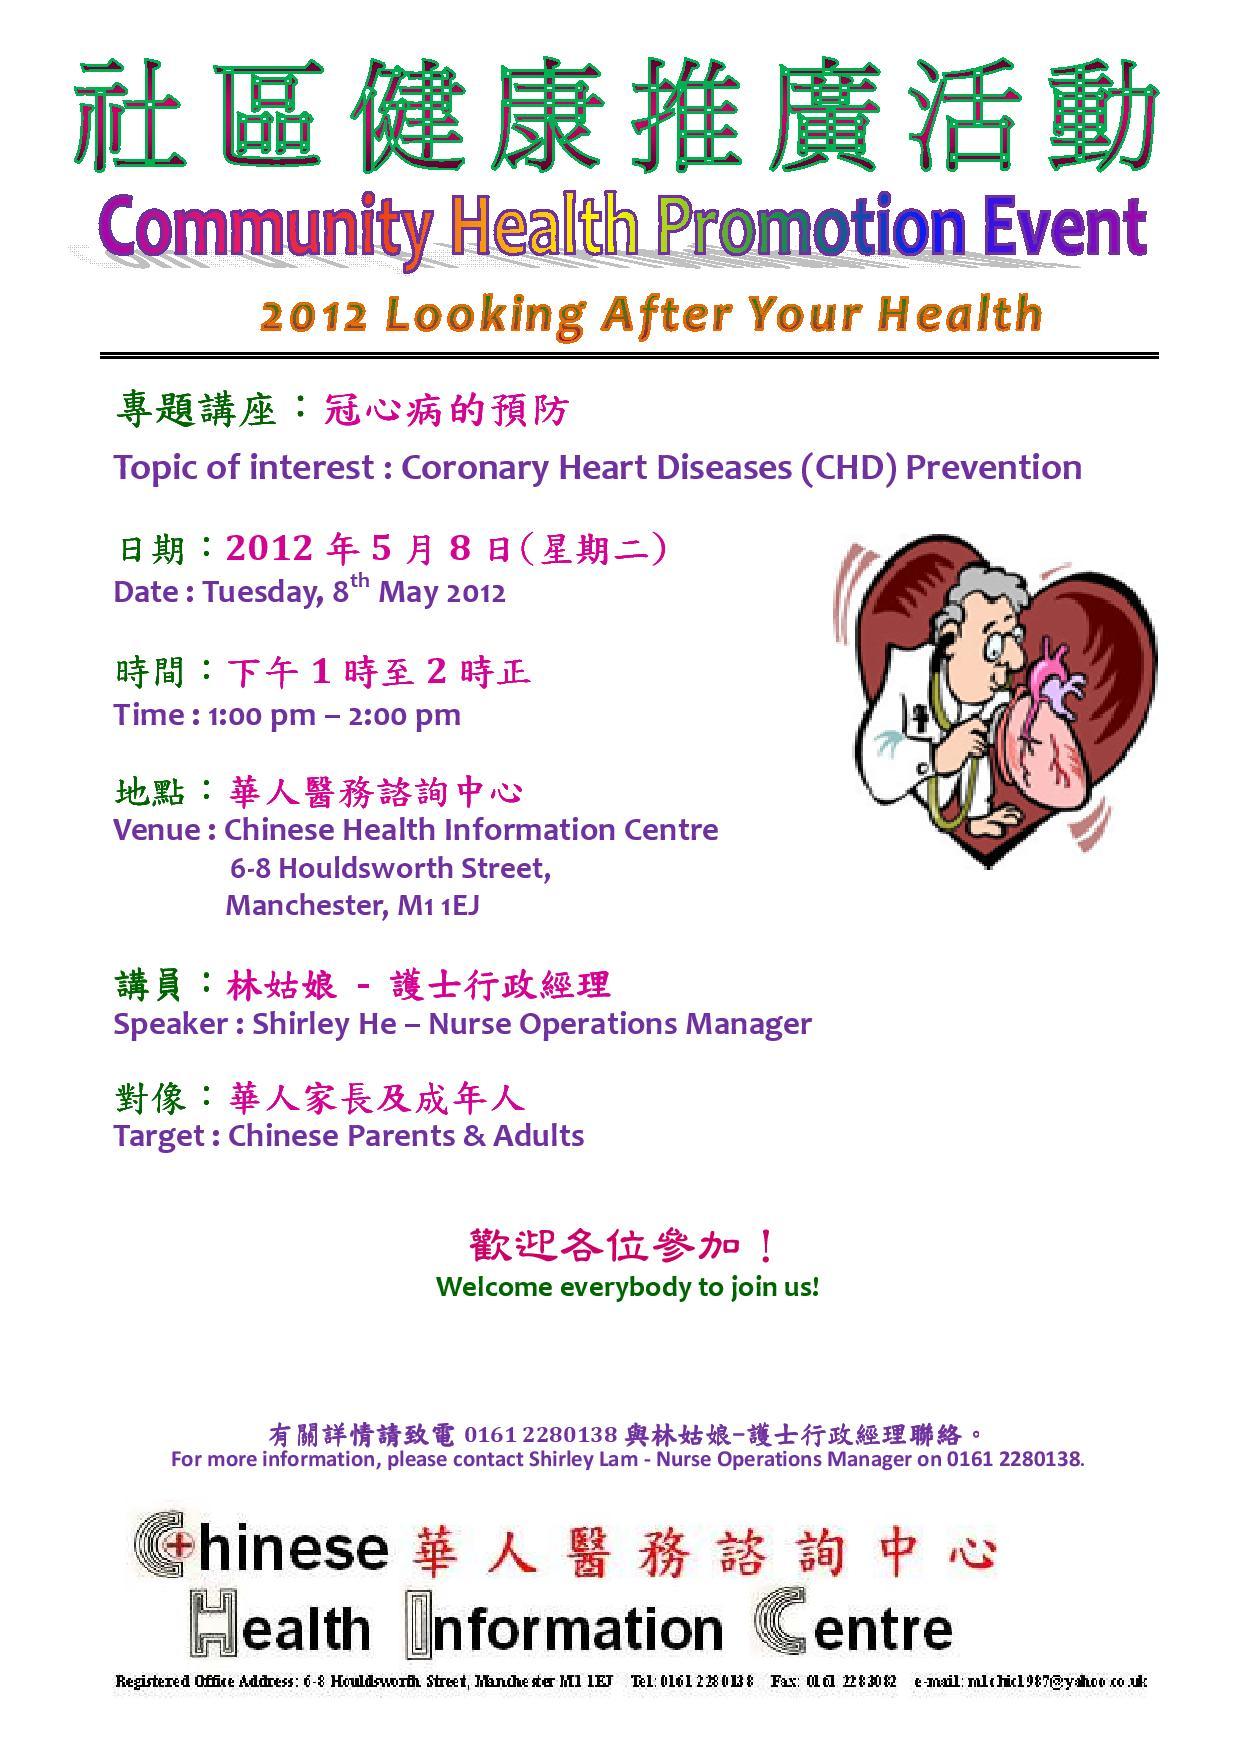 Coronary Heart Diseases (CHD) Prevention